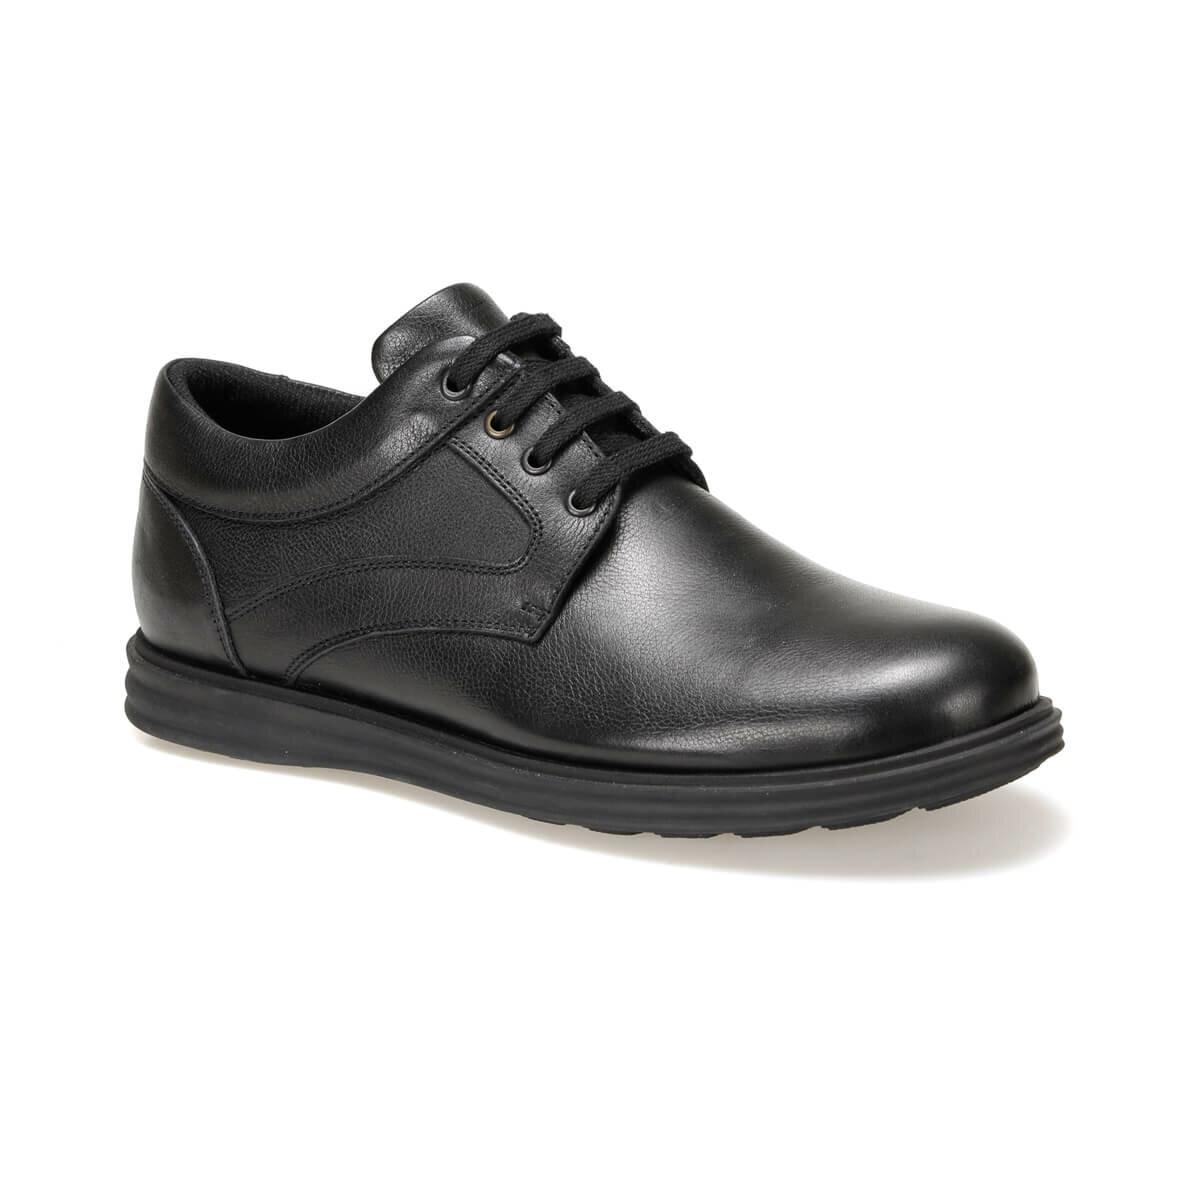 FLO 89425-1 Black Male Shoes Flogart